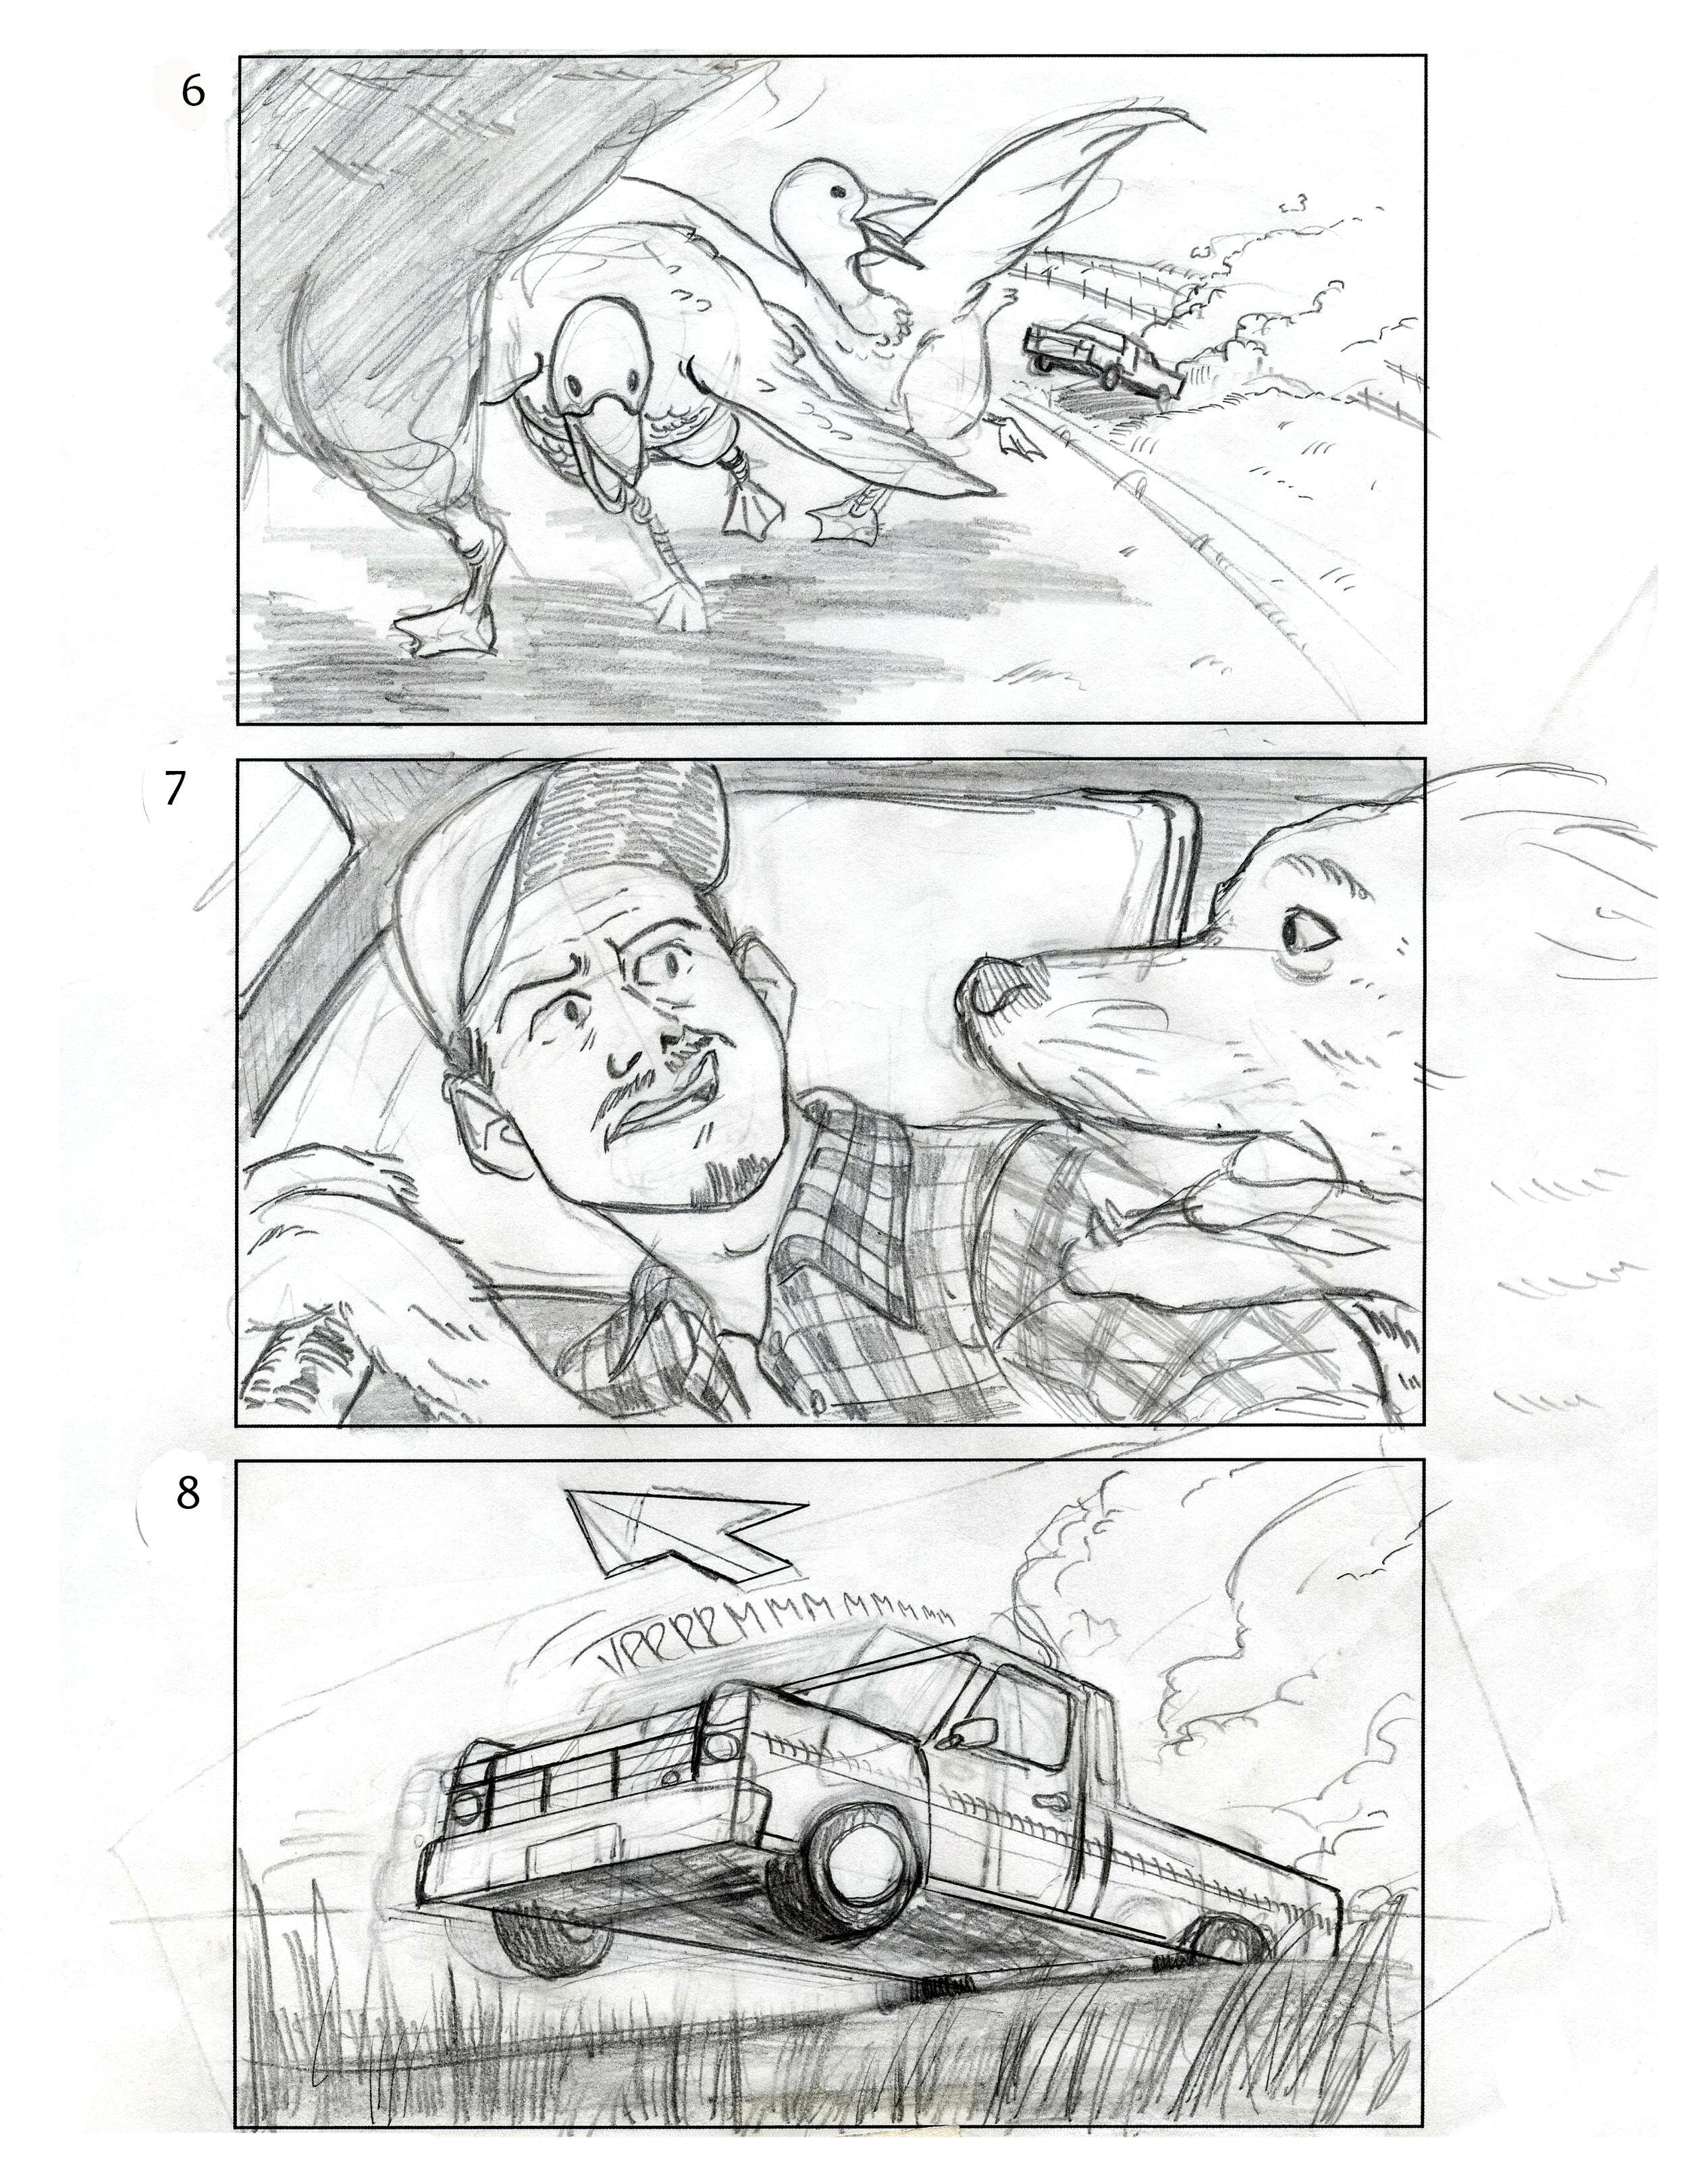 Storyboard2_6-8.jpg